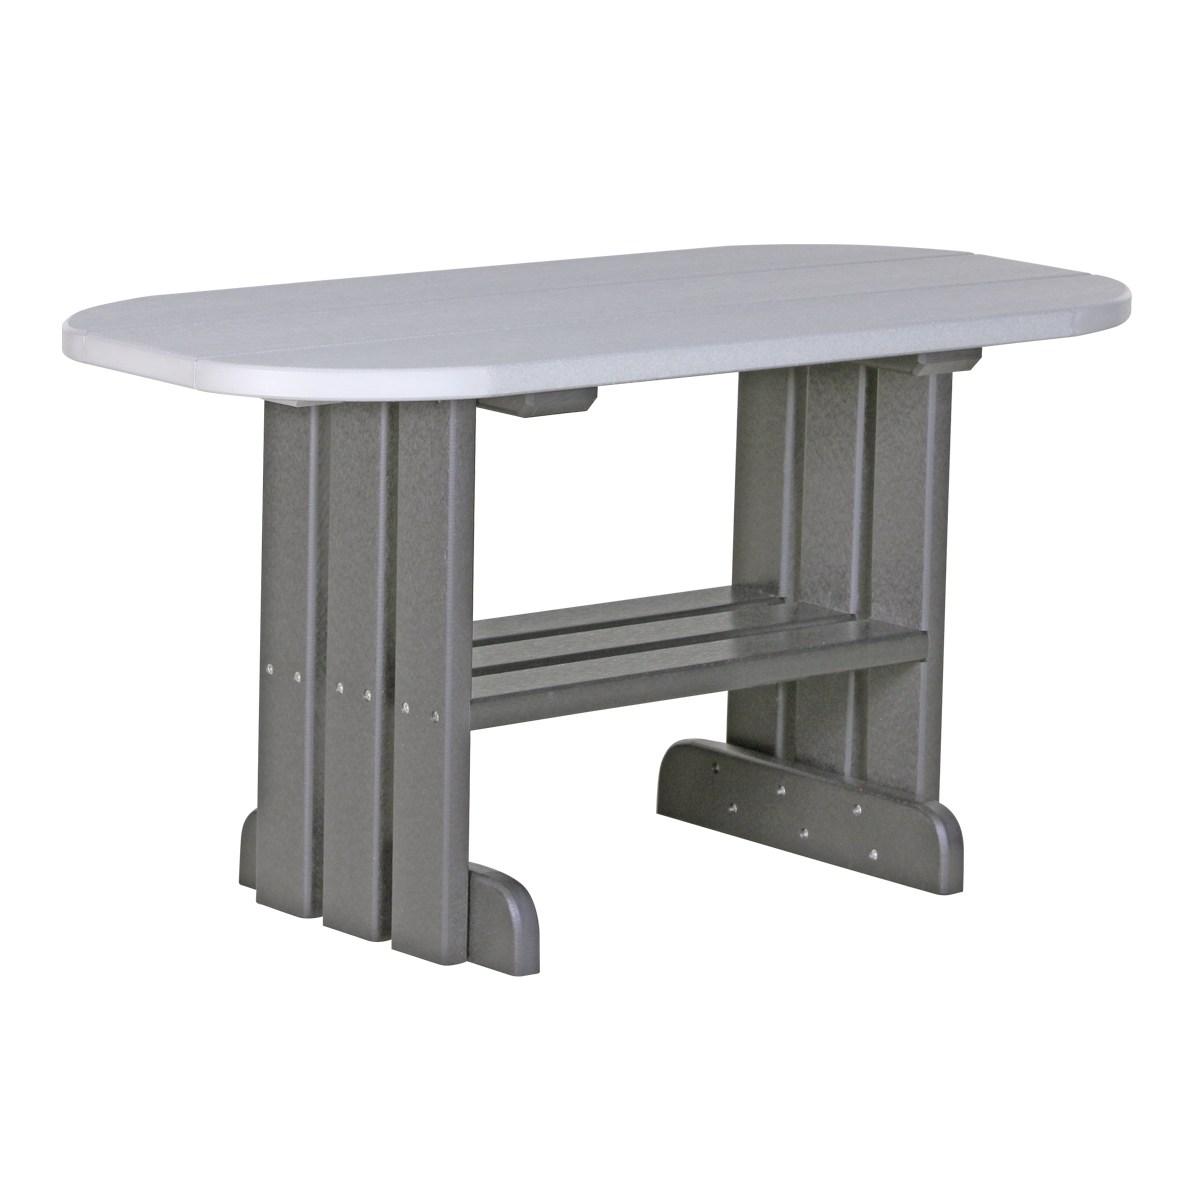 Slate Outdoor Coffee Table: Outdoor Coffee Table